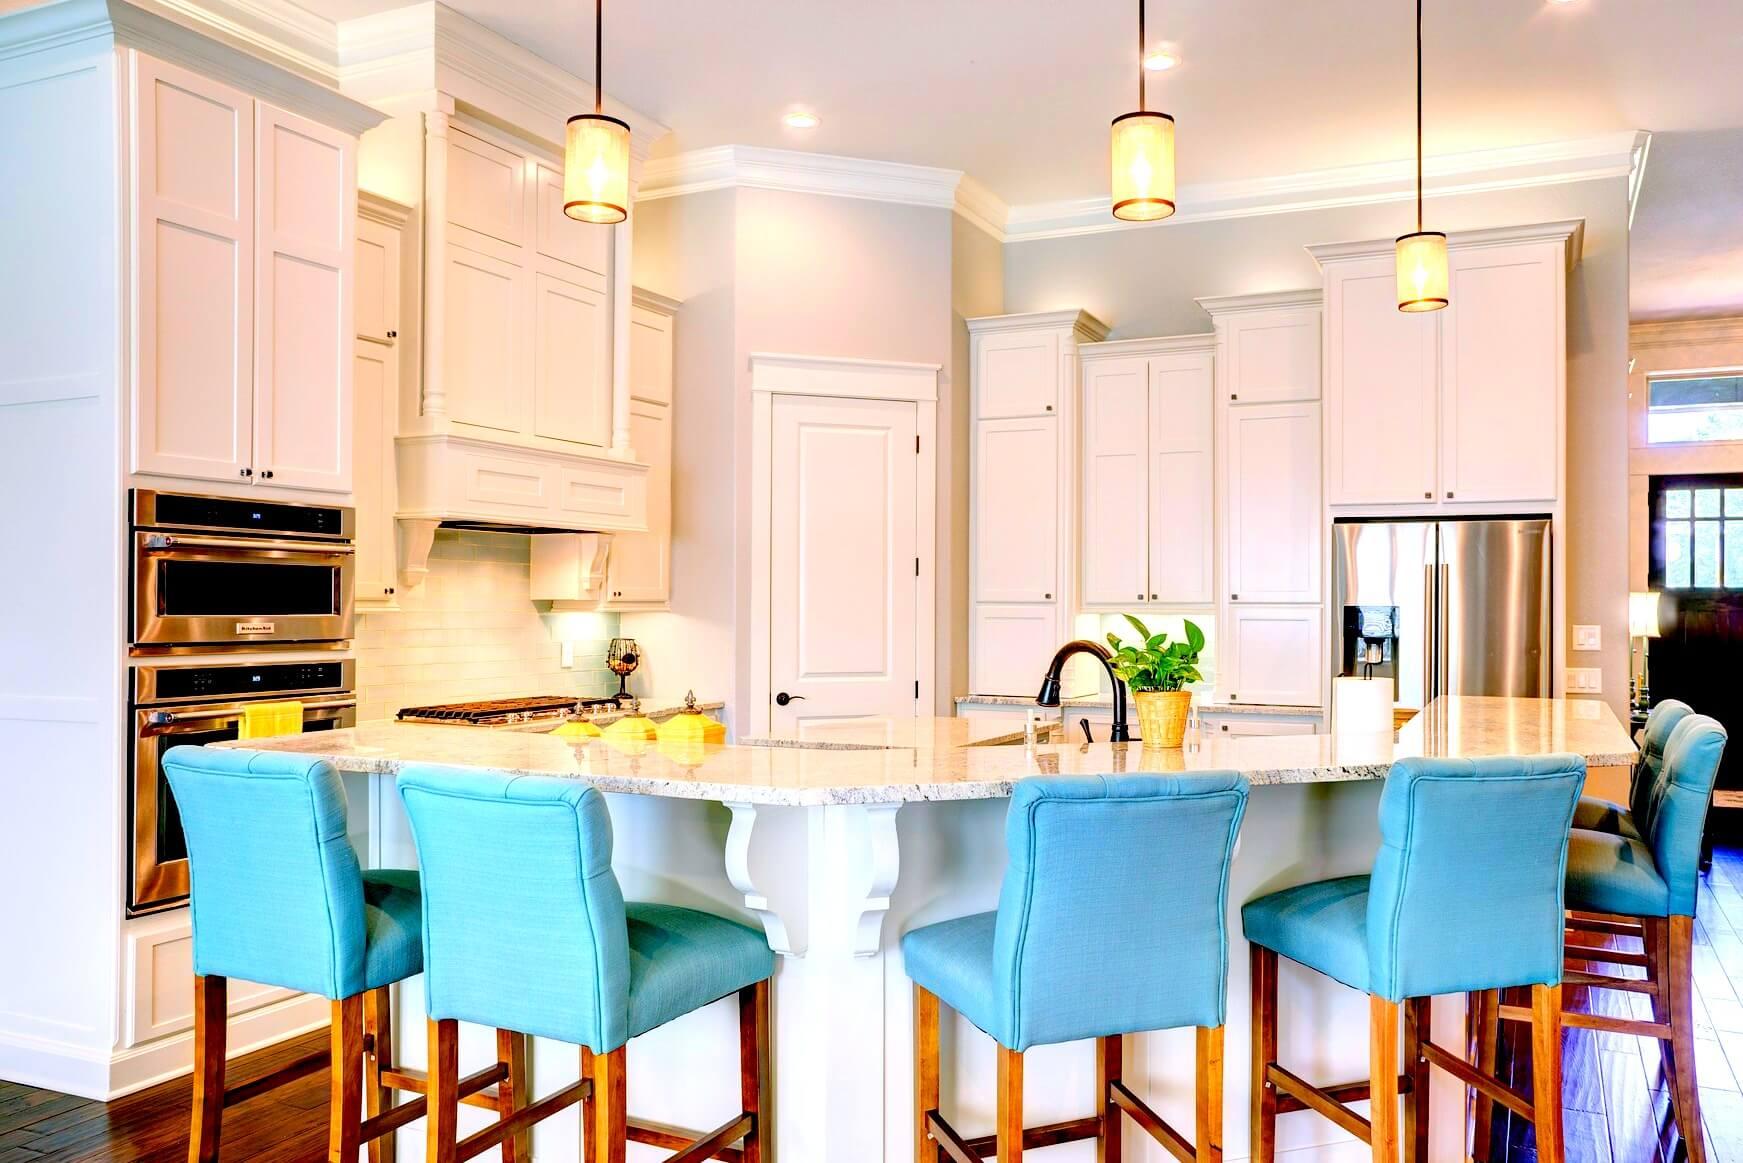 Rinnova cucina vernice - Rinnovare mobili cucina ...